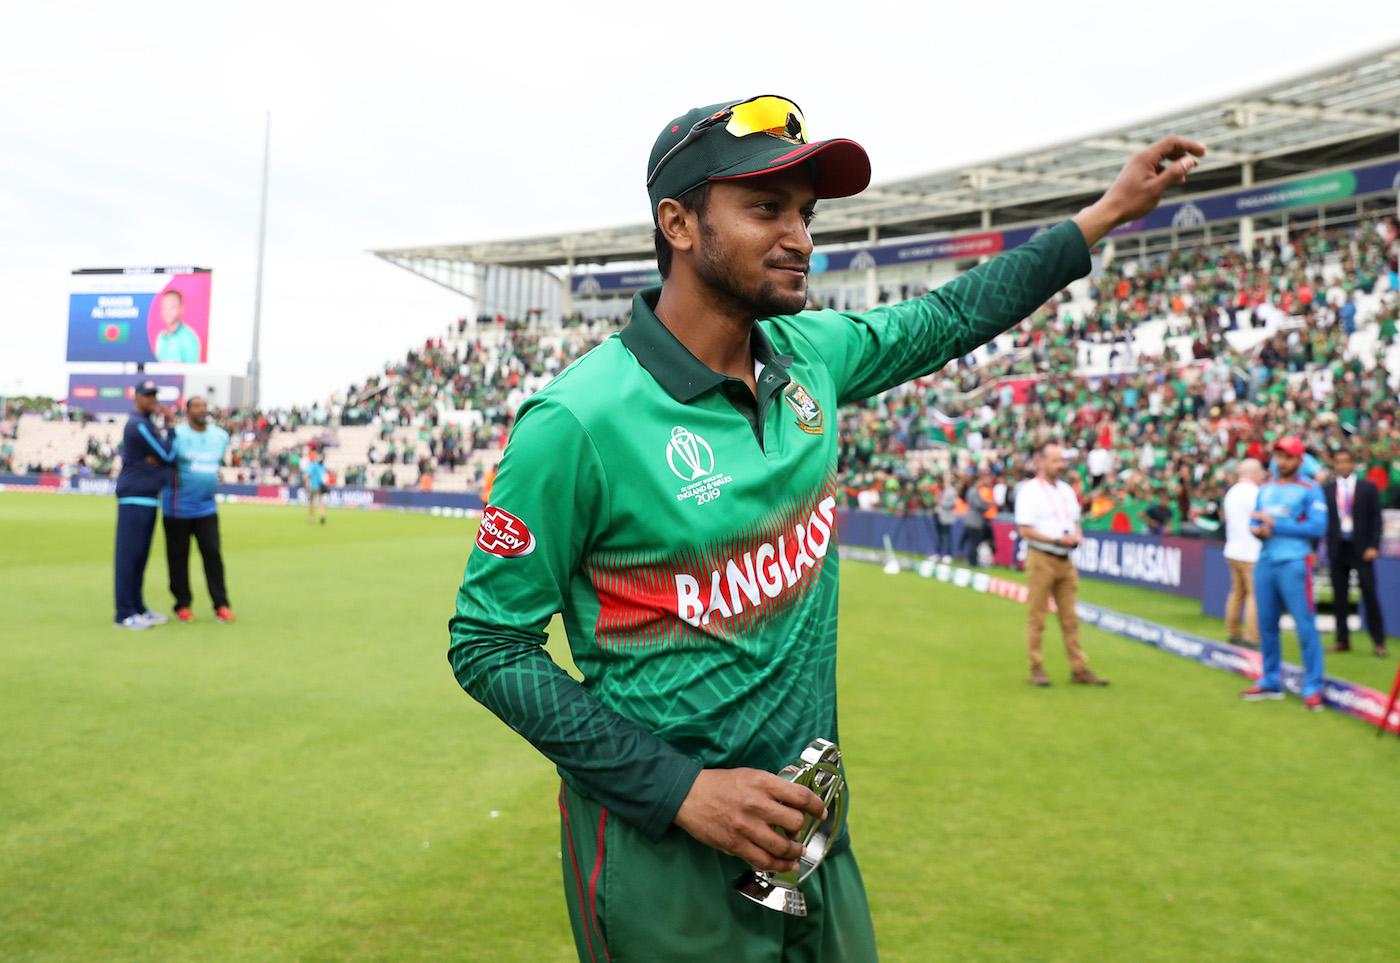 ICC World Cup 2019: Michael Hussey Picks Shakib Al Hasan As The Best Player Thus Far 1